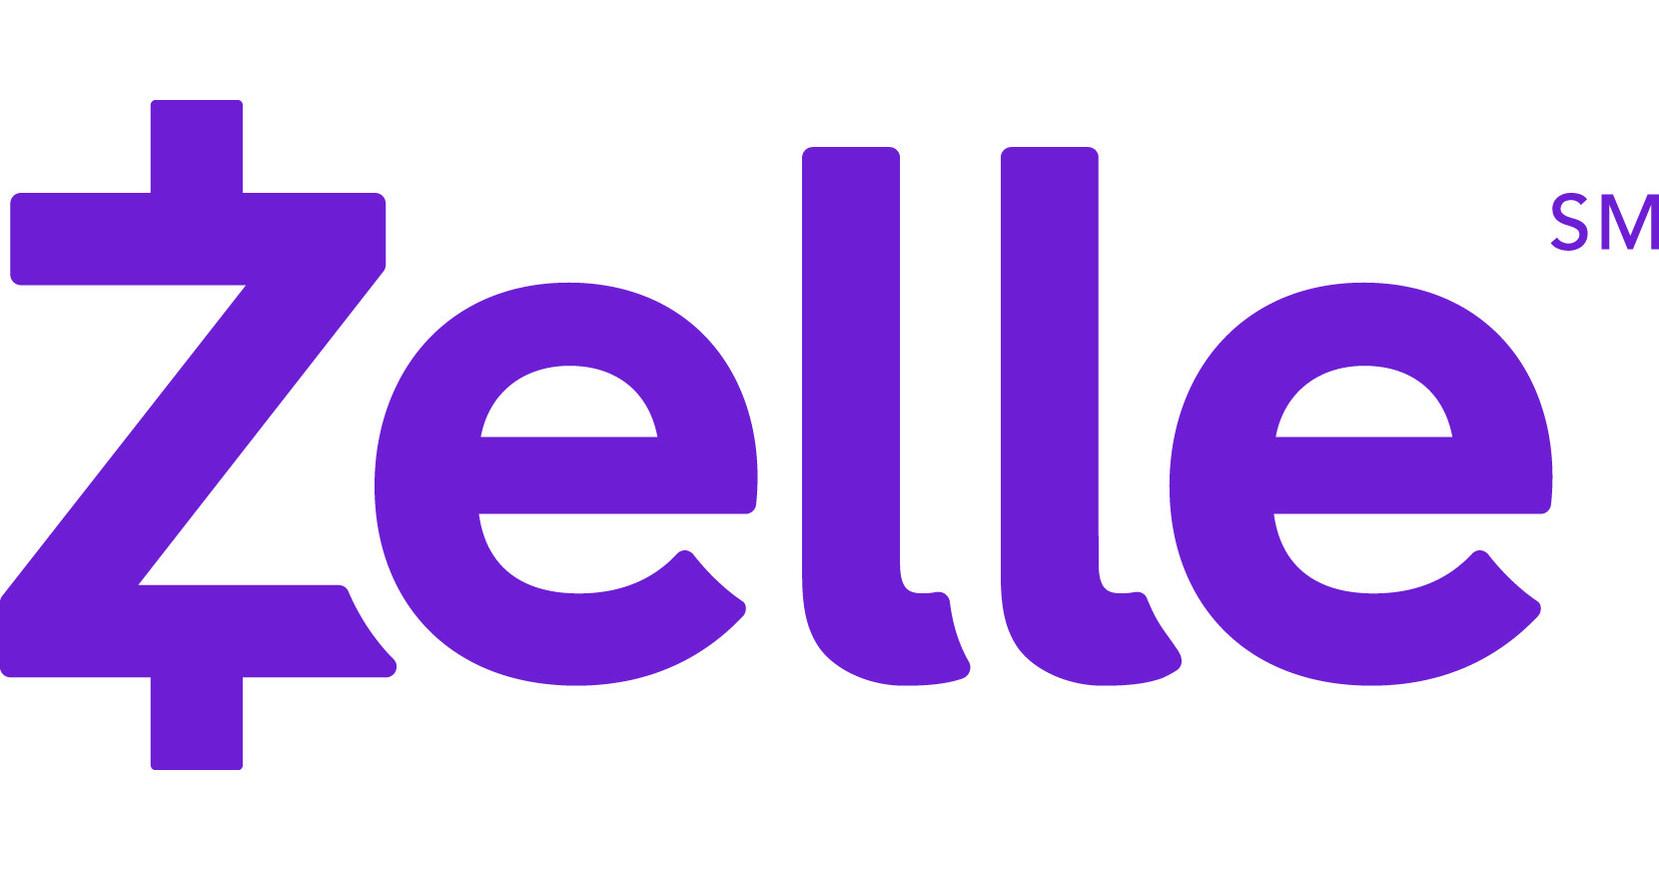 Zelle 174 Money Movement Momentum Continues